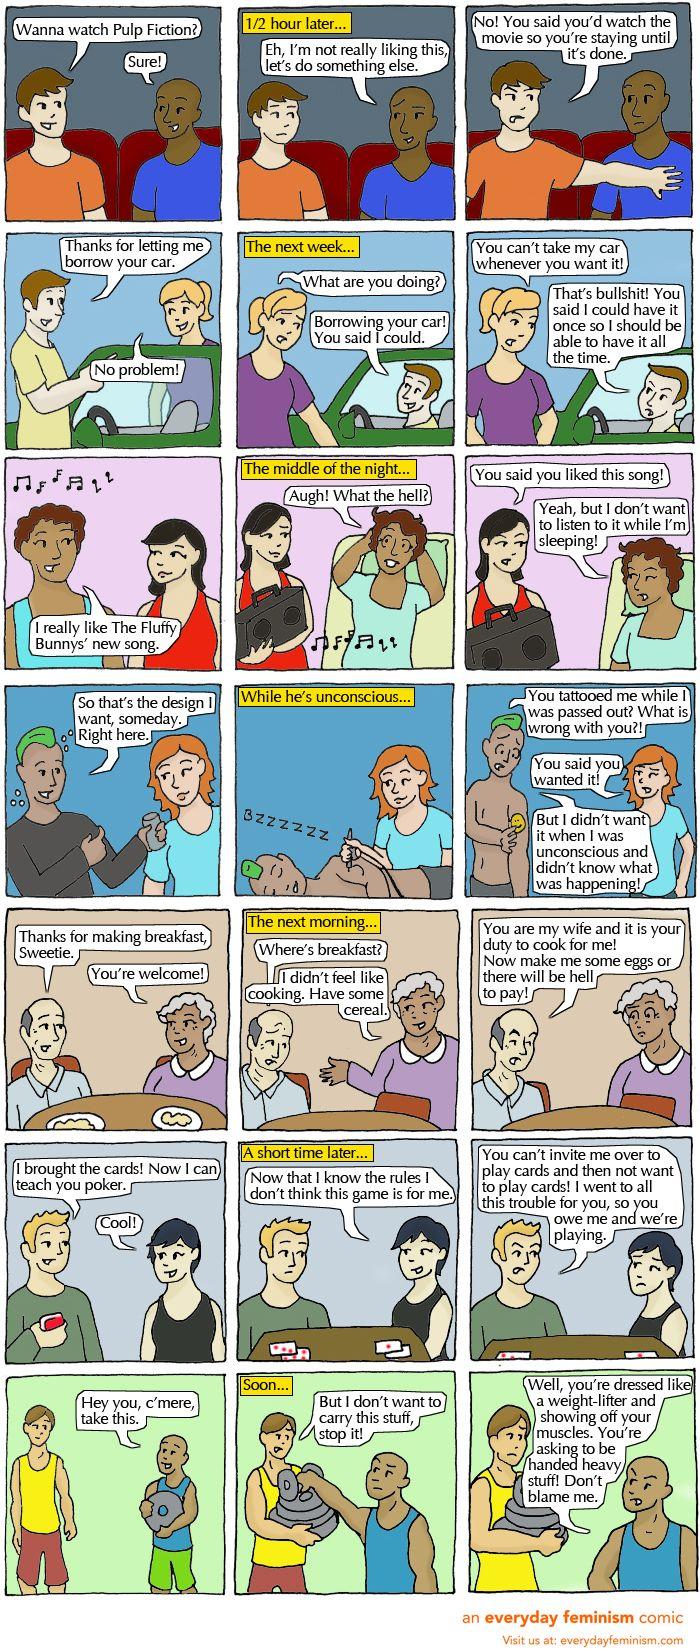 Genialer Comic zeigt, wie absurd Sexualstraftäter sich erklären